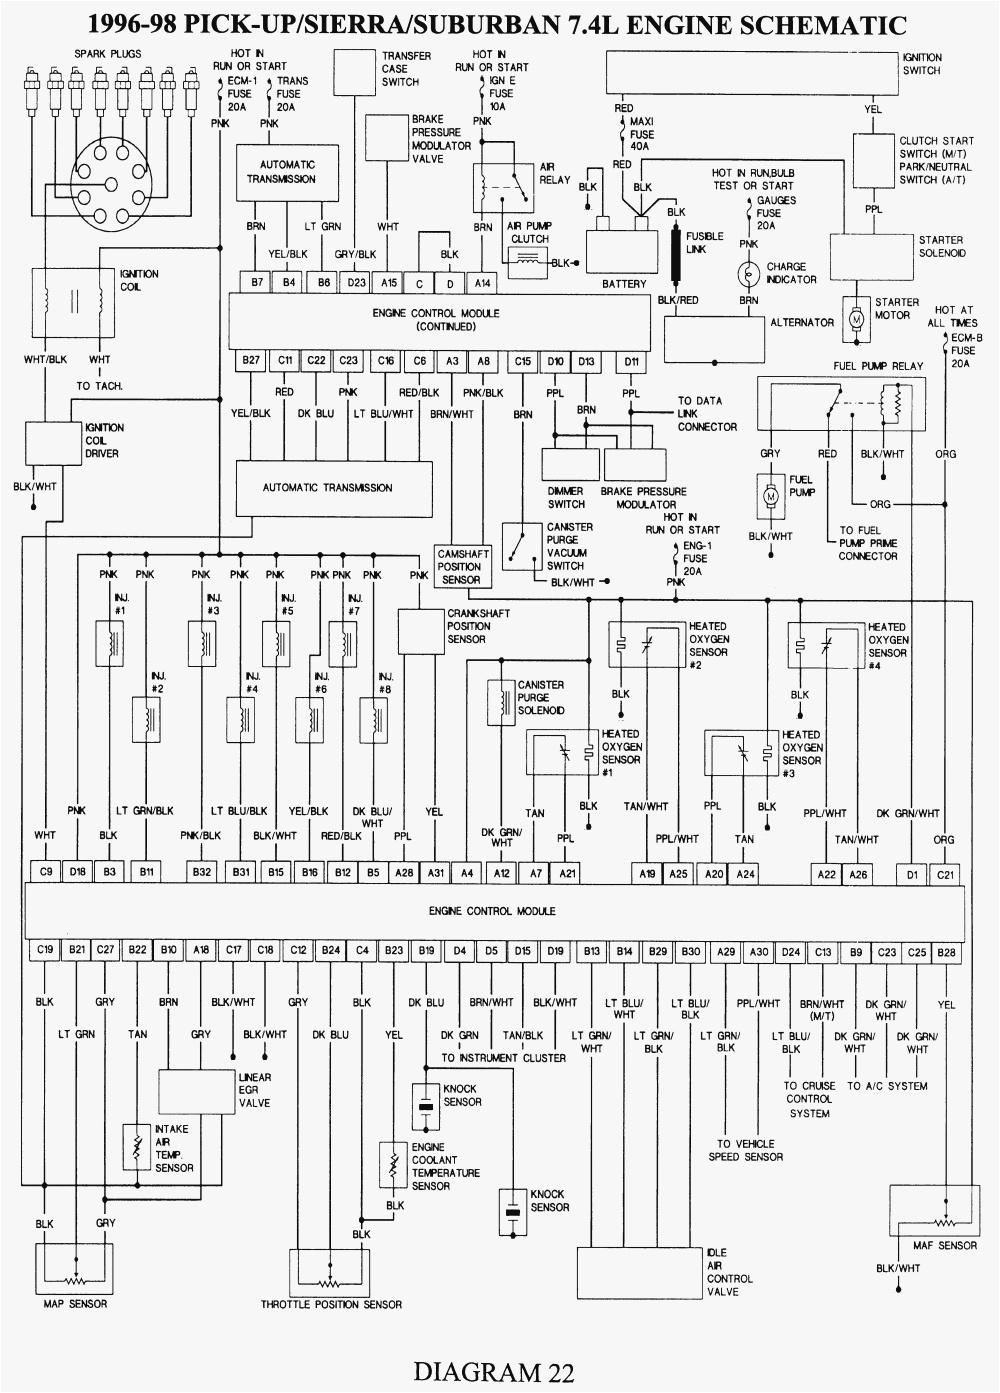 1998 chevy suburban heater hose diagram jpg